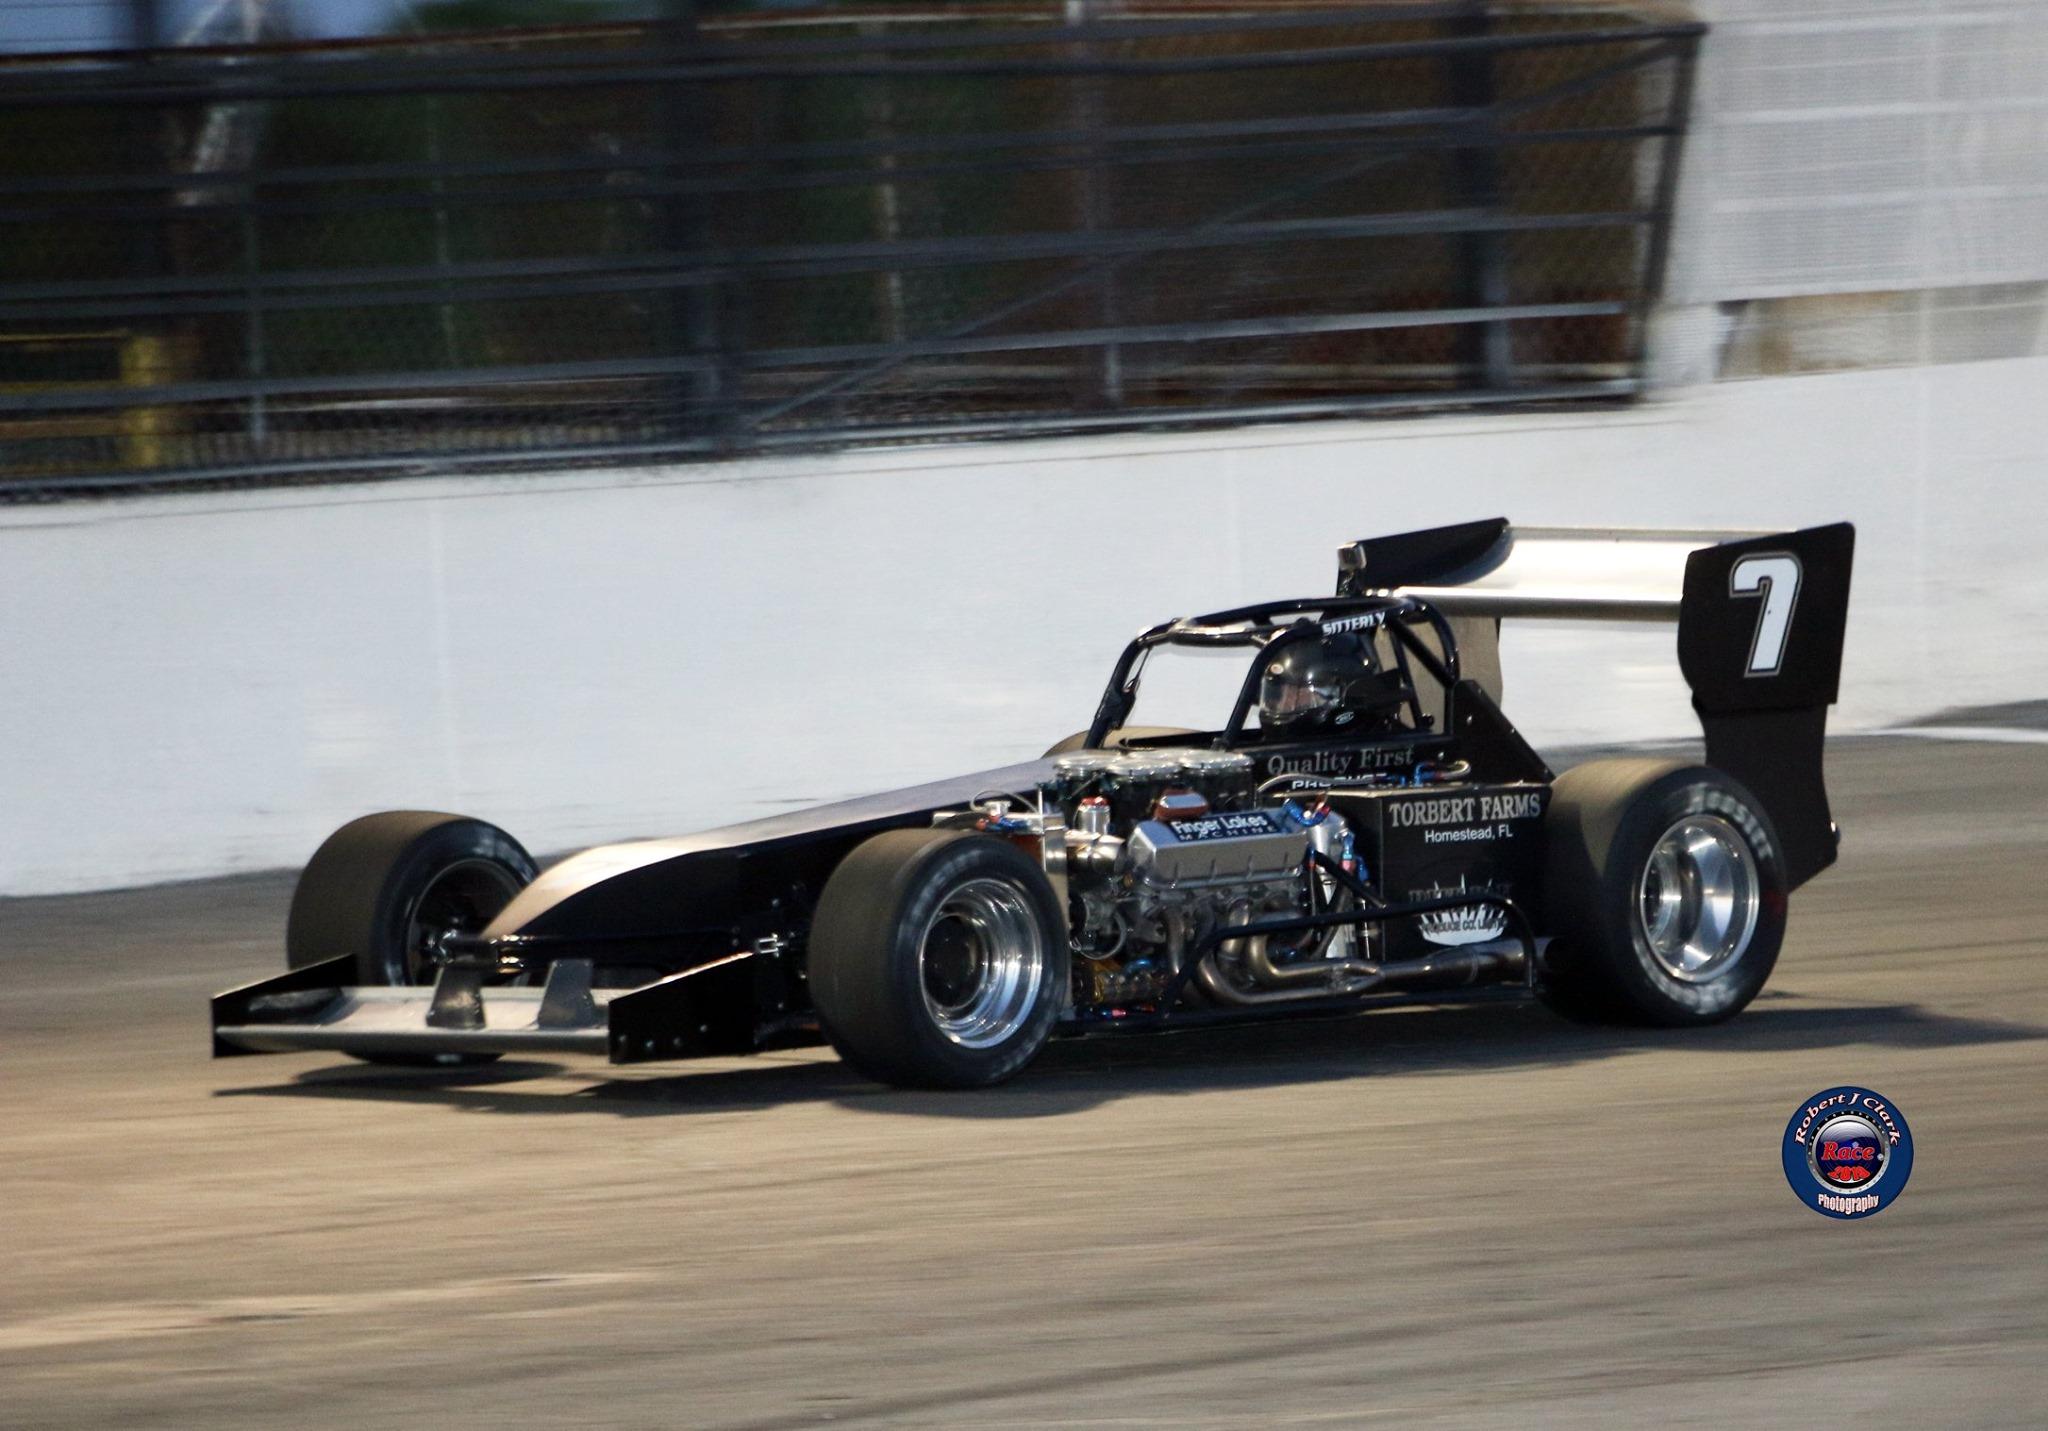 Otto Sitterly in action Saturday, June 8 at Oswego Speedway (Robert J Clark photo)